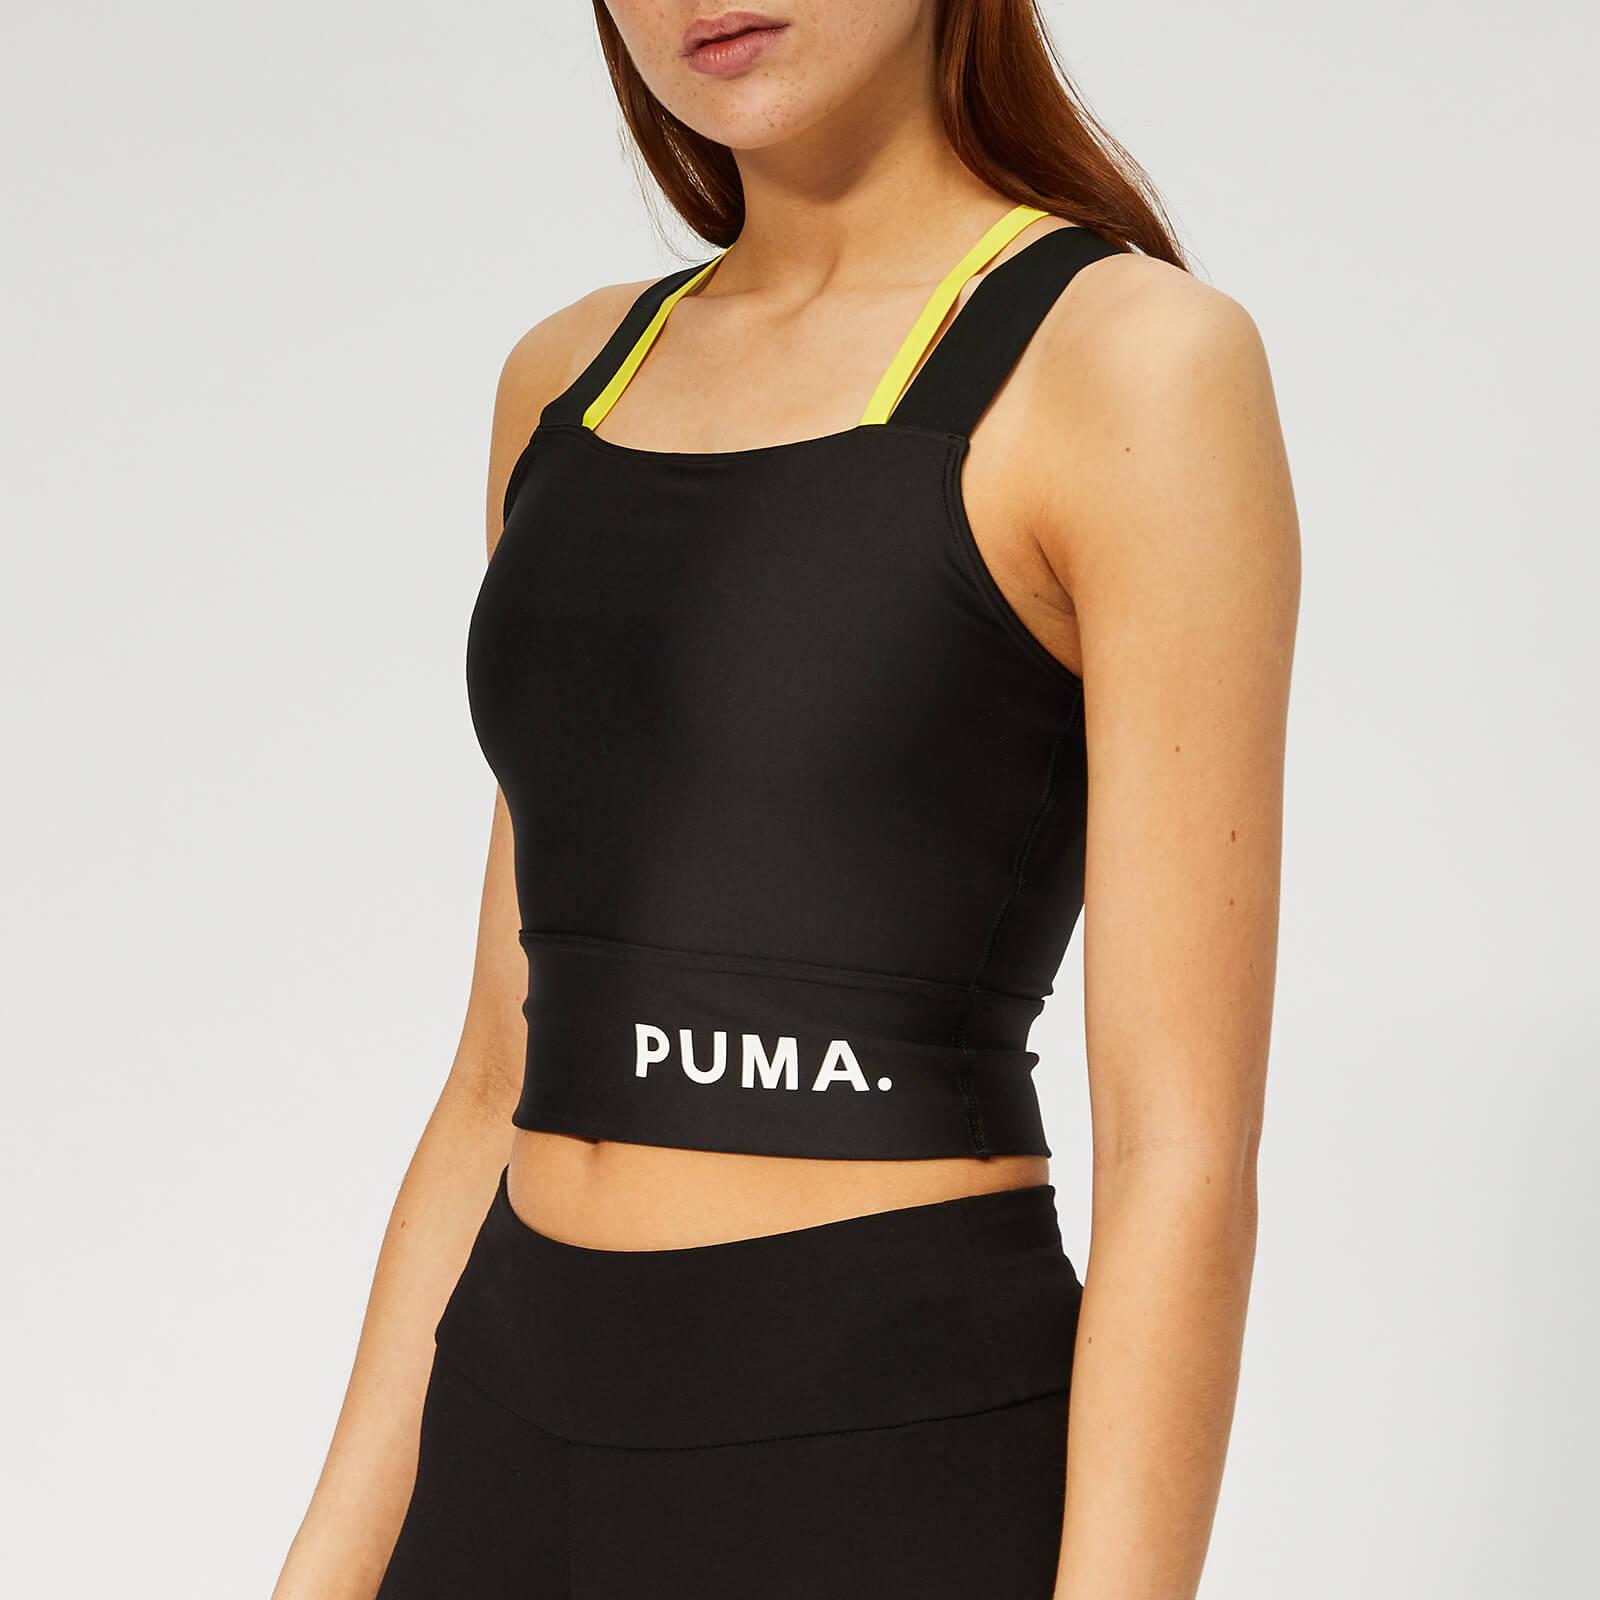 adverbio rizo salario  Puma Women's Chase Crop Top - Puma Black Sports & Leisure | TheHut.com